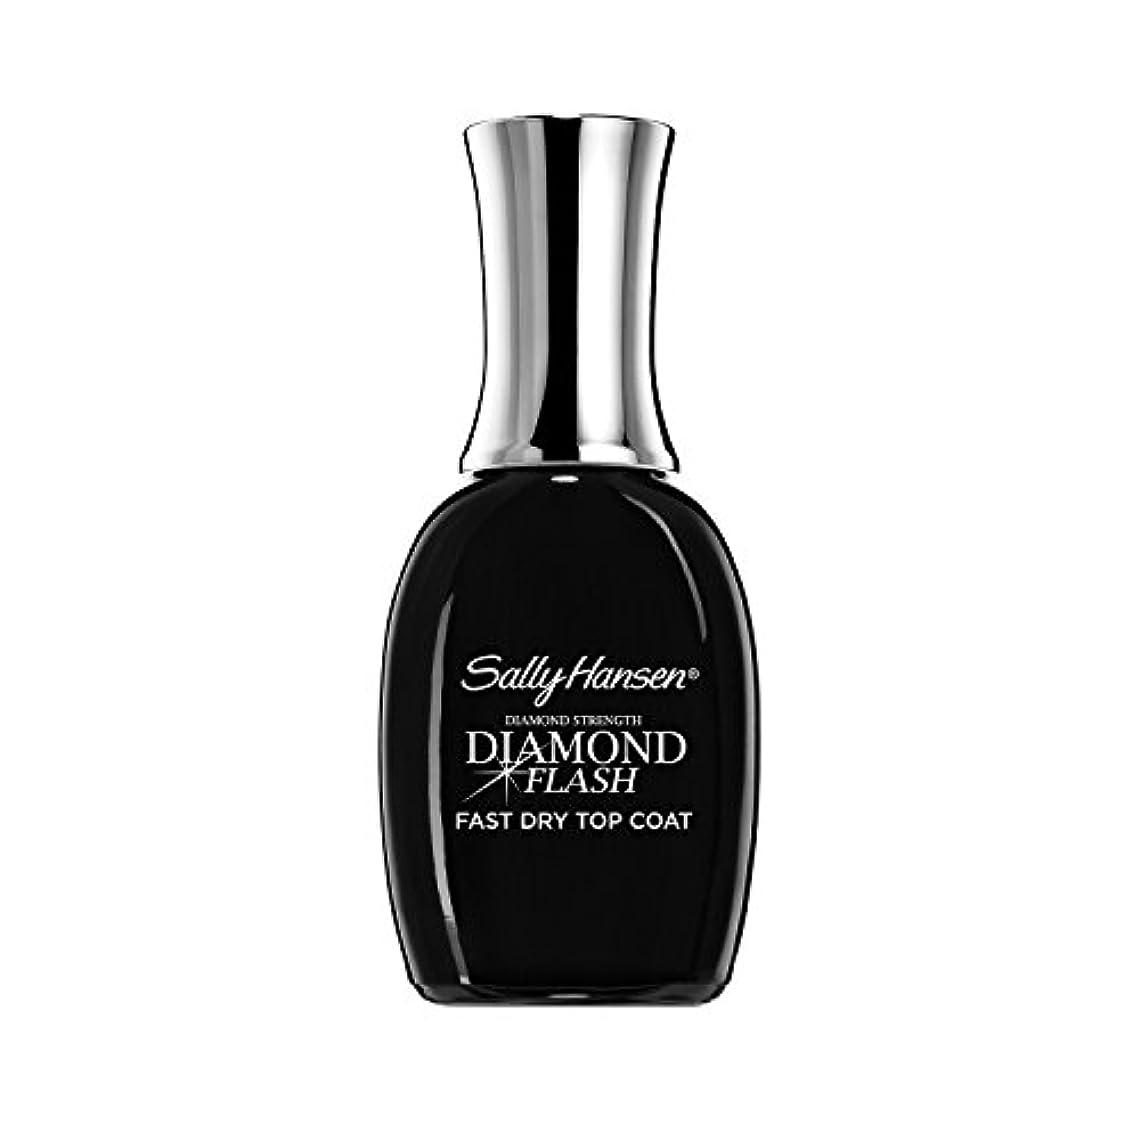 Sally Hansen Diamond Flash Fast Dry Top Coat 14 ml (並行輸入品)